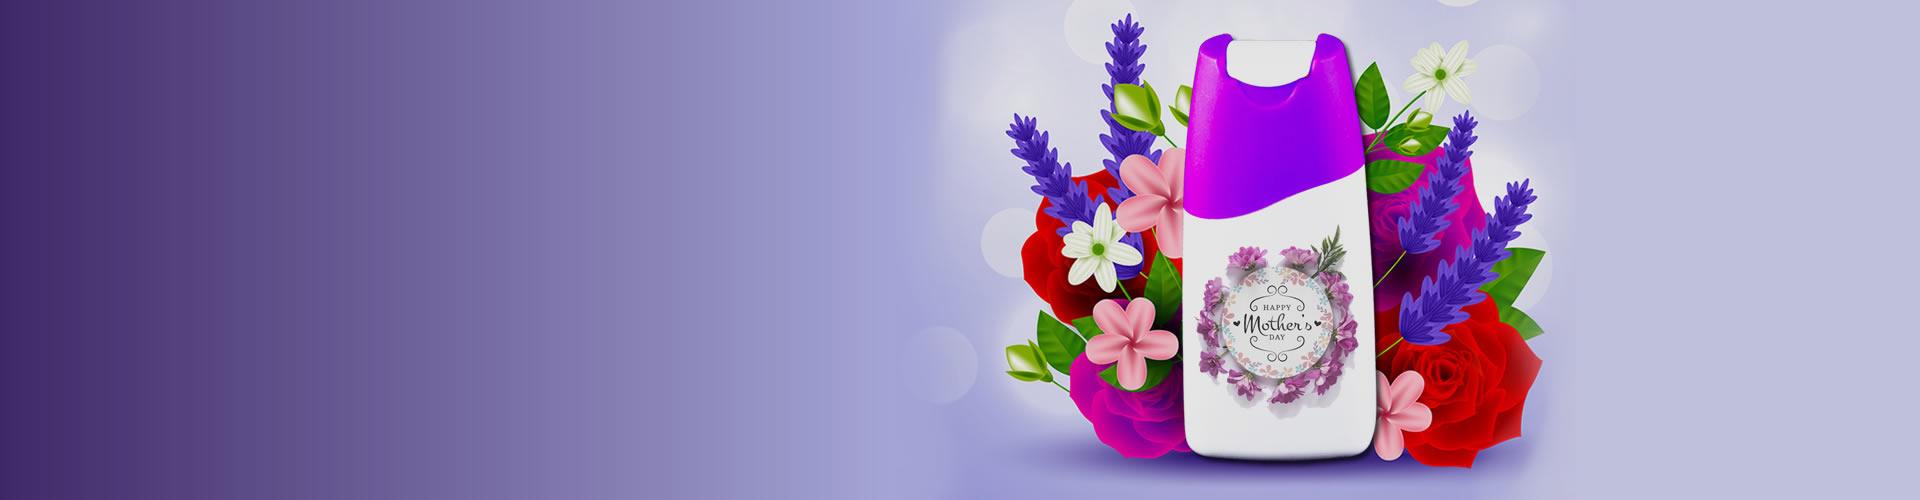 datafiles/banner/divulgacao-embalagens-plasticas-cosmeticos.jpg